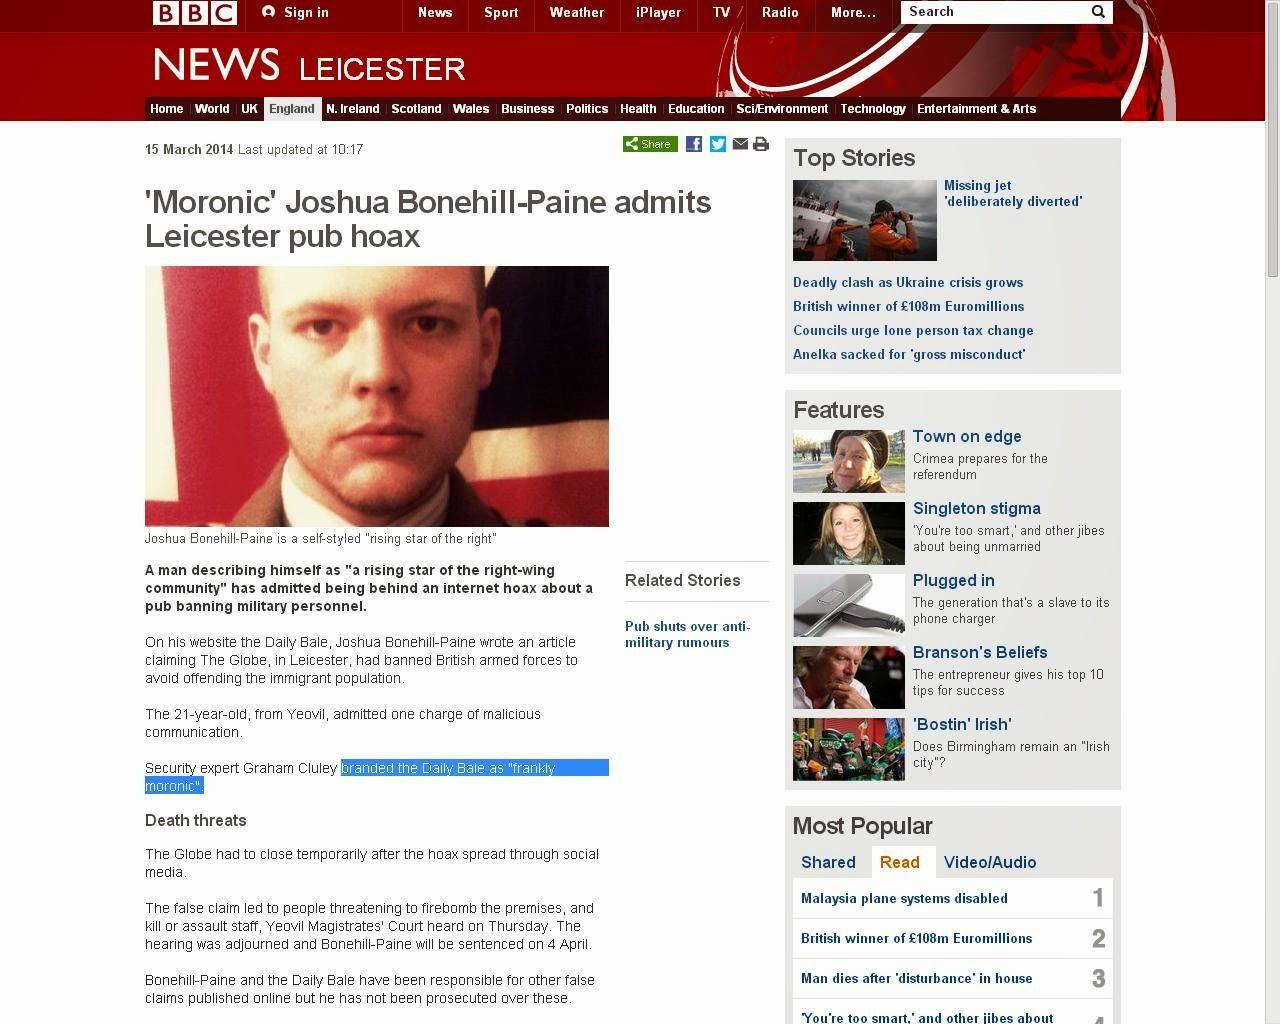 Joshua Bonehill - Moronic hoaxer